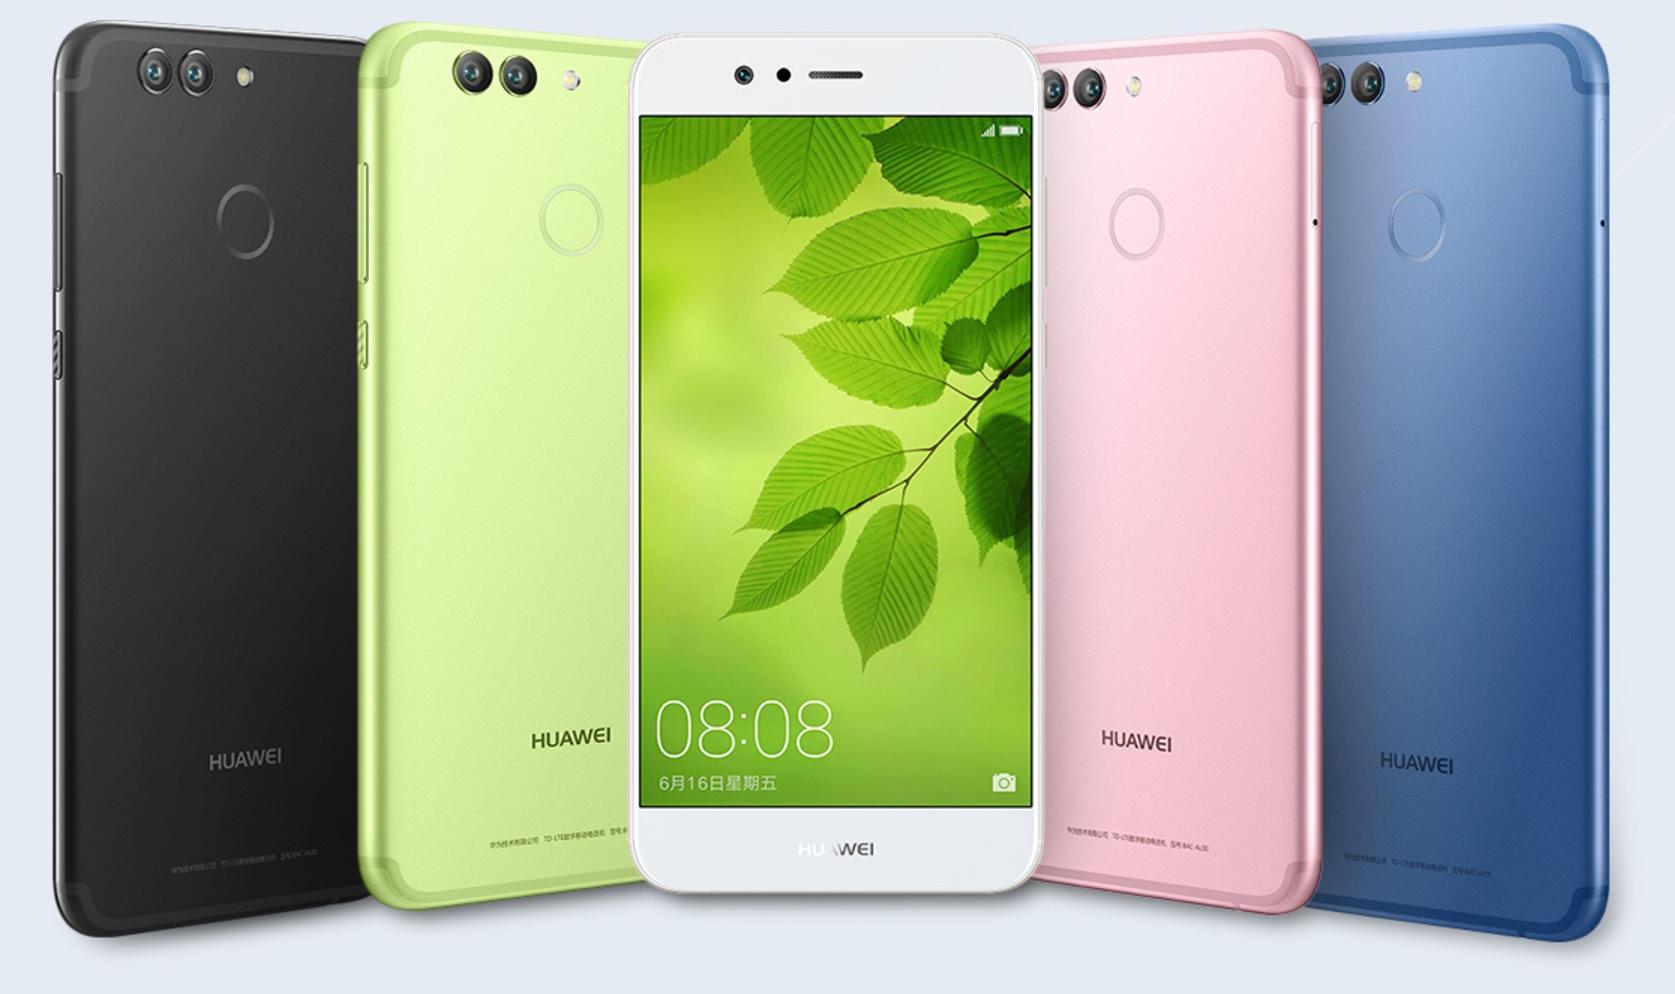 Huawei stellt nova 2 und nova 2 Plus vor